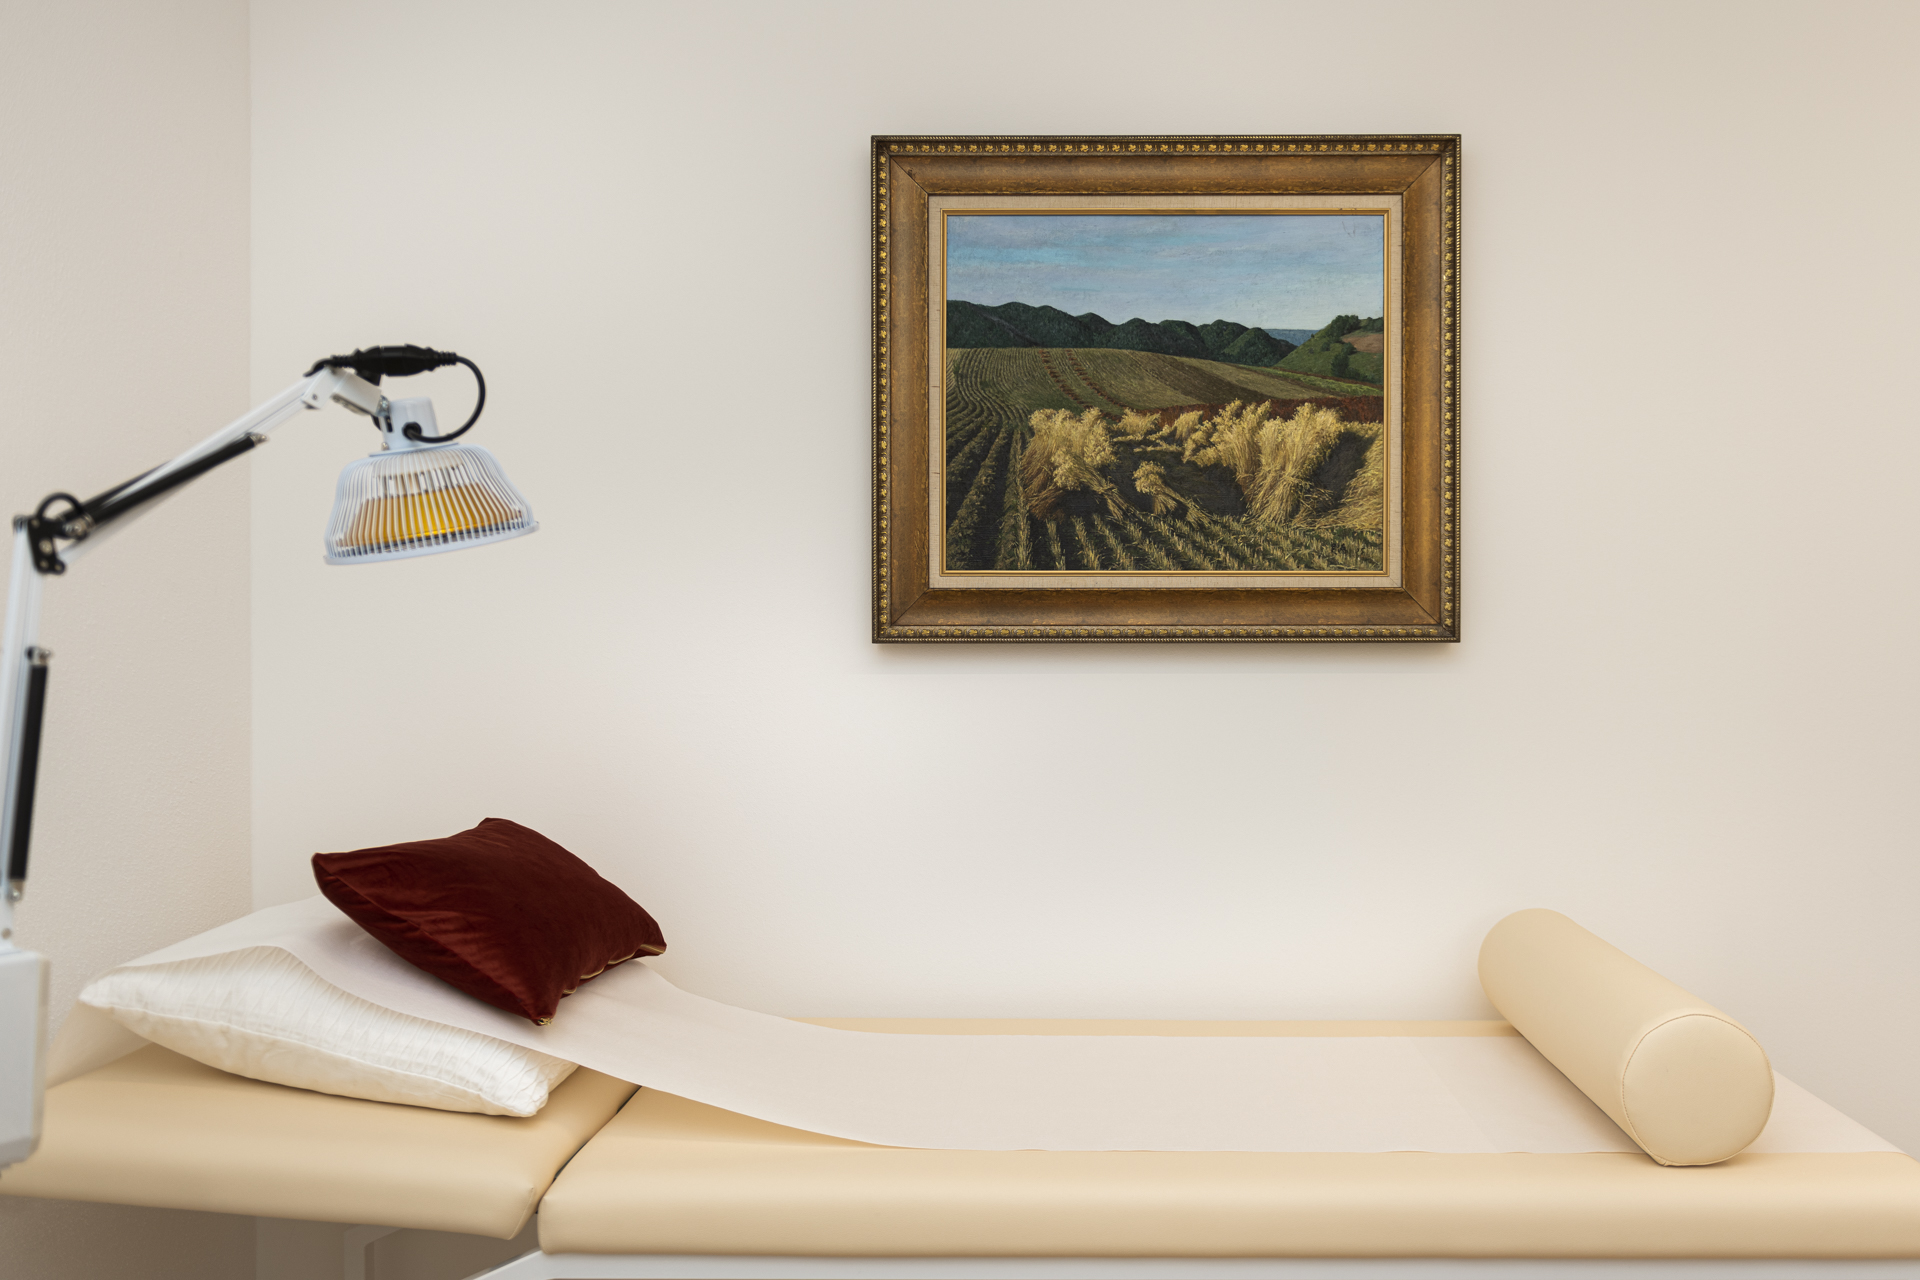 Internistin-Dr-Di-Chen-Koenig-Innsbruck-Behandlung-11